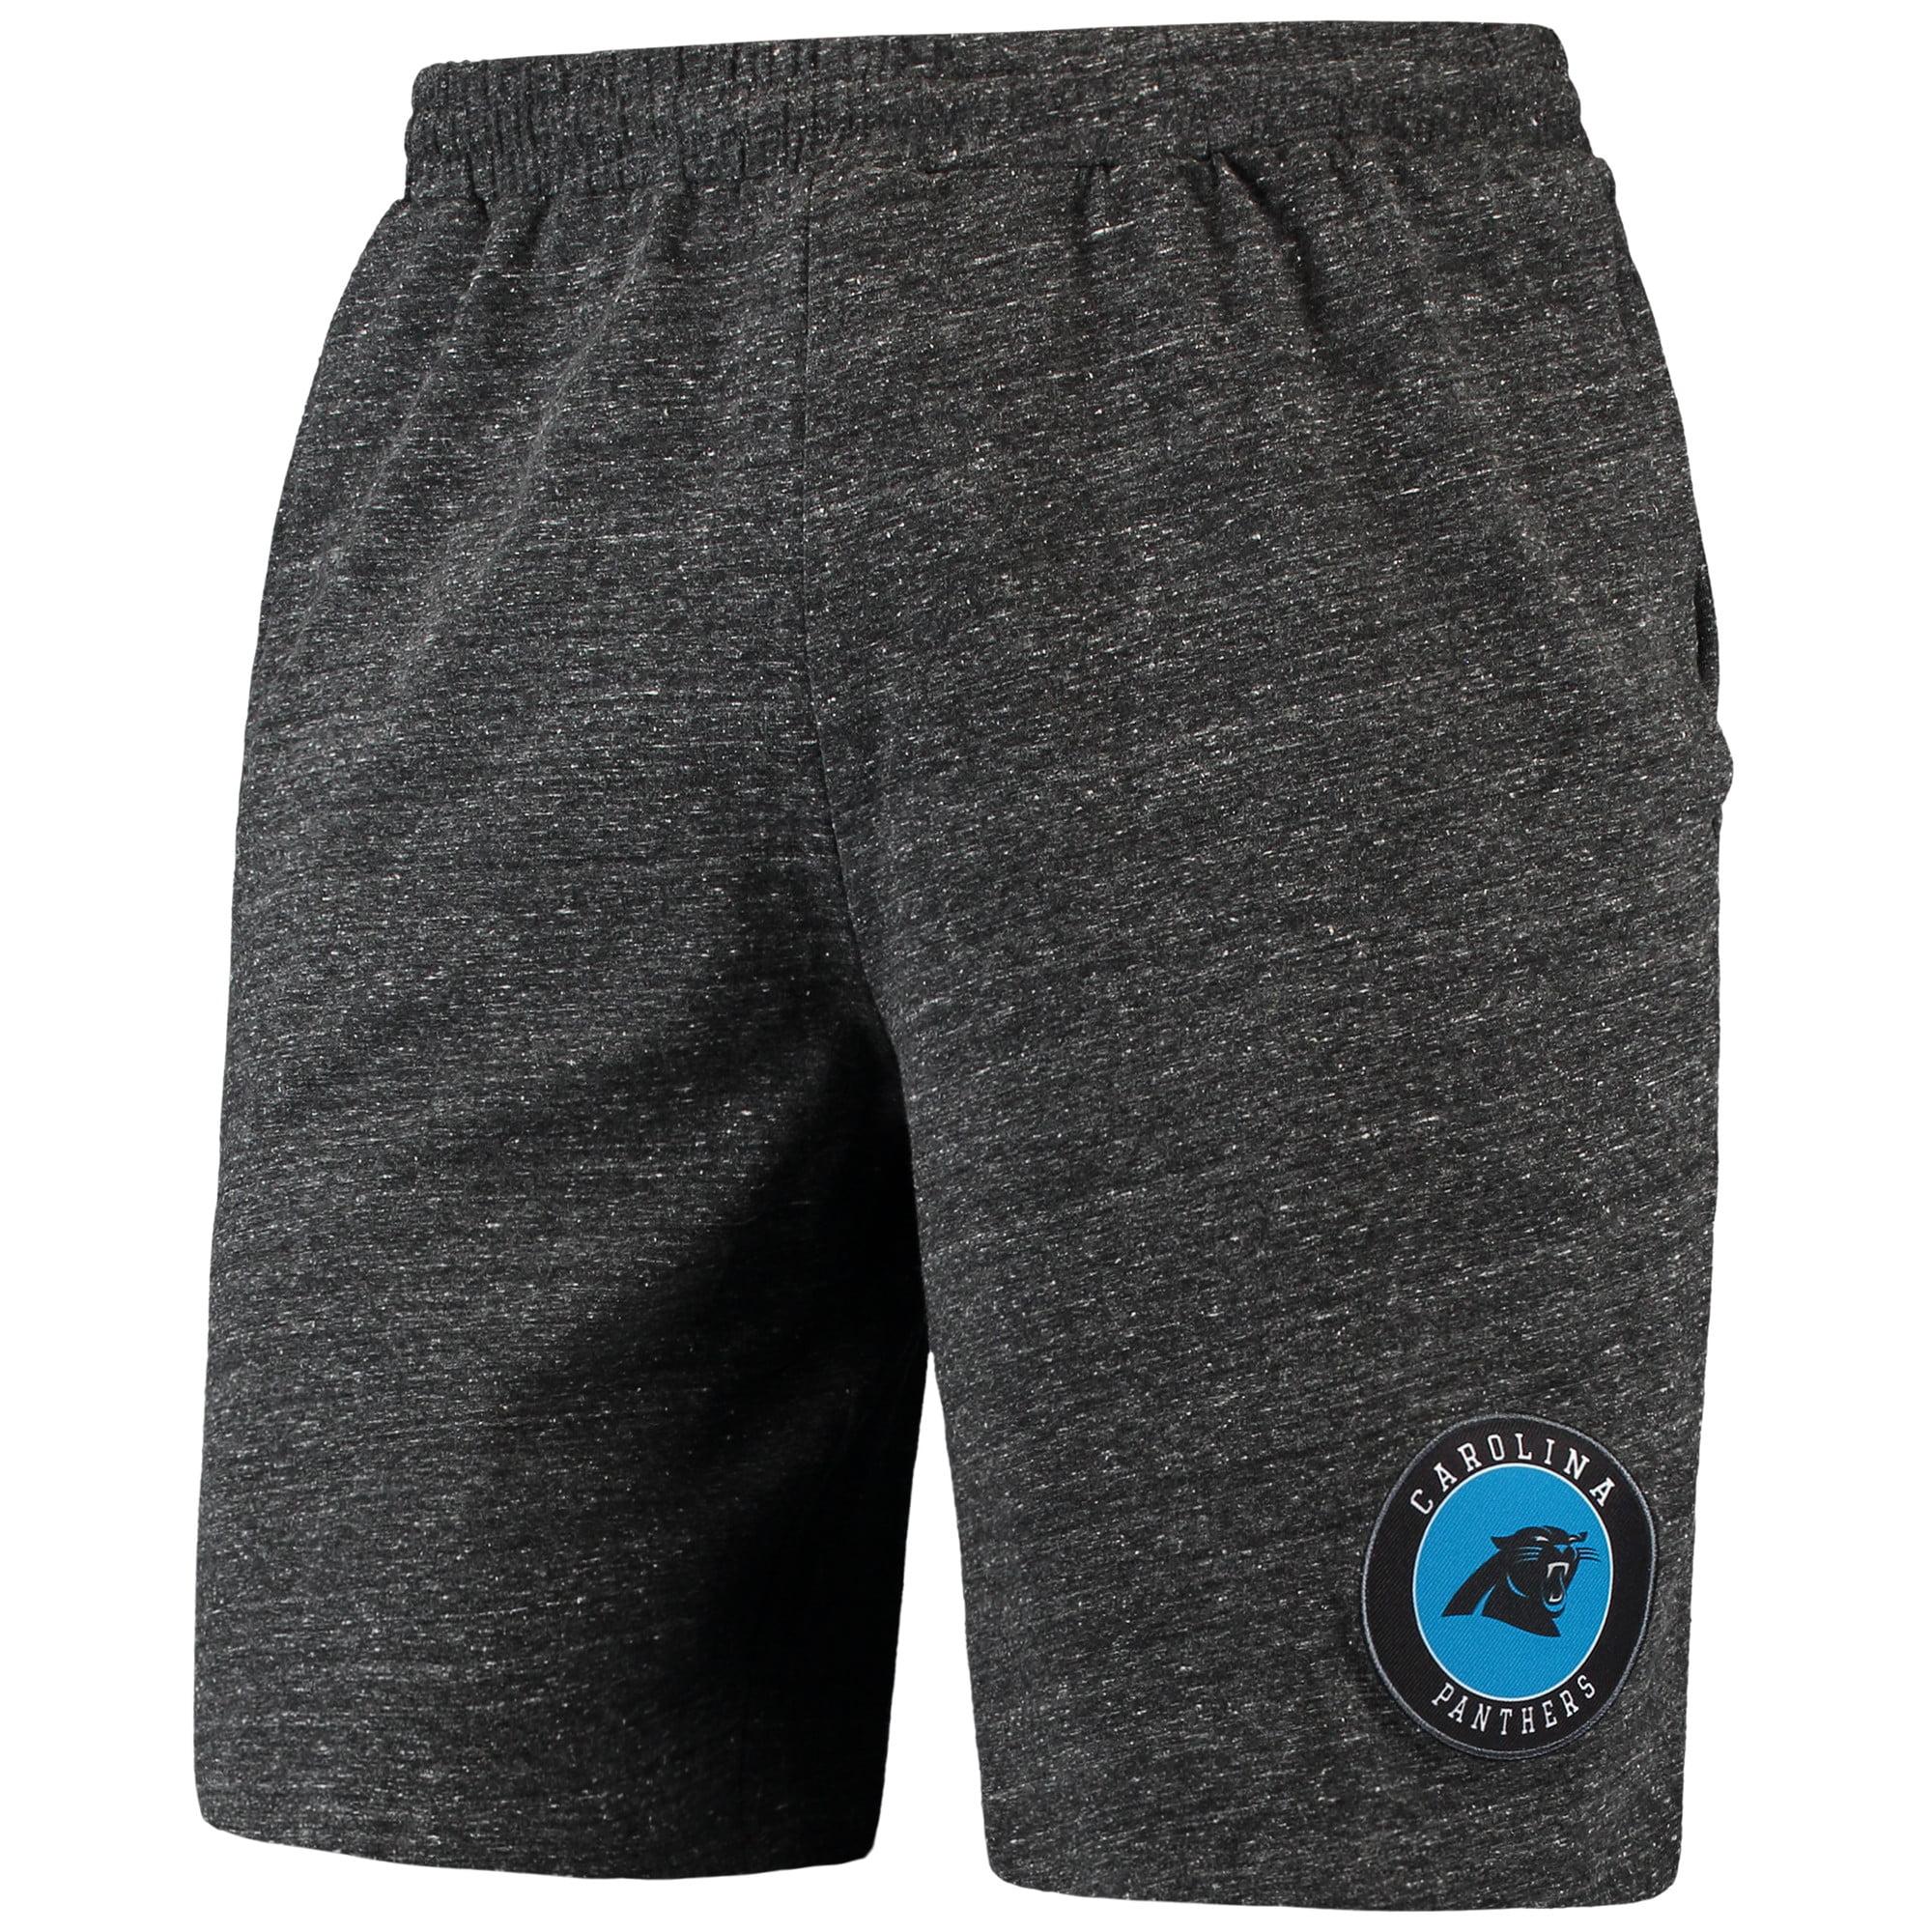 Carolina Panthers Concepts Sport Pitch Knit Shorts - Charcoal